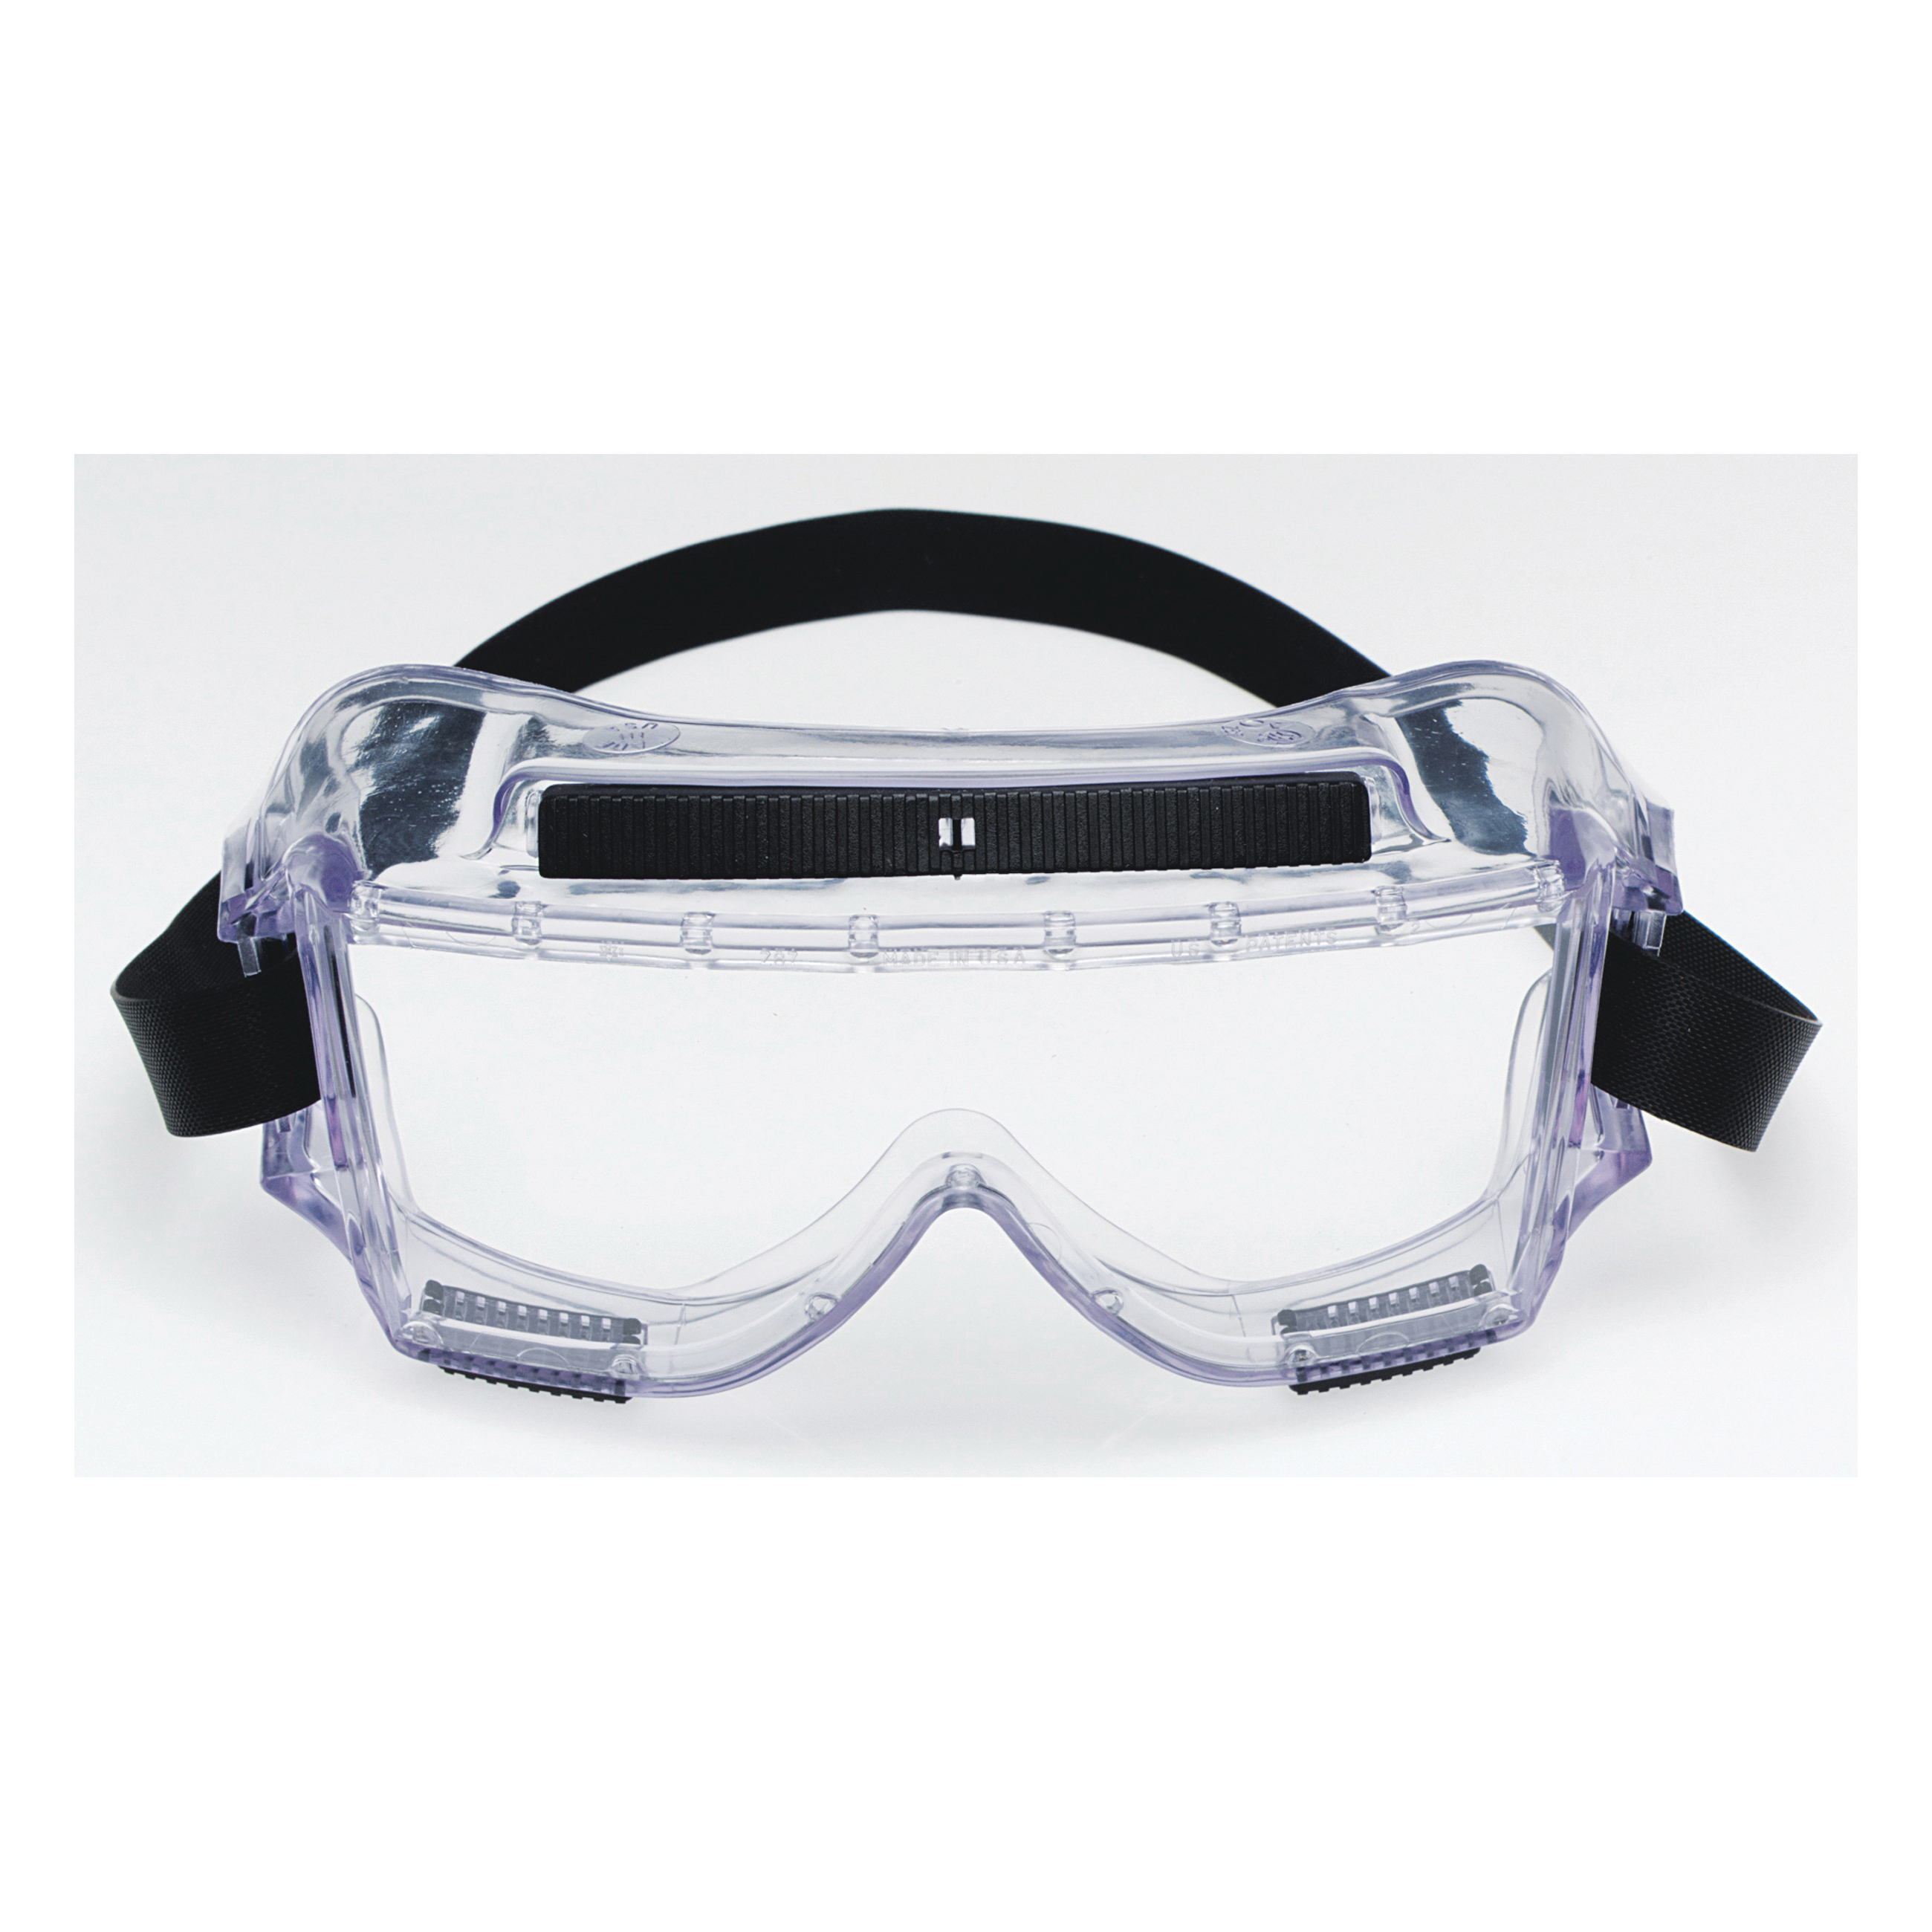 3M™ Centurion™ 078371-62390 40305-00000-10 Standard Value Safety Goggles, Anti-Fog Clear Polycarbonate Lens, 99.9% % UV Protection, Neoprene Strap, CSA Z94.3-2007, ANSI Z87.1-2003